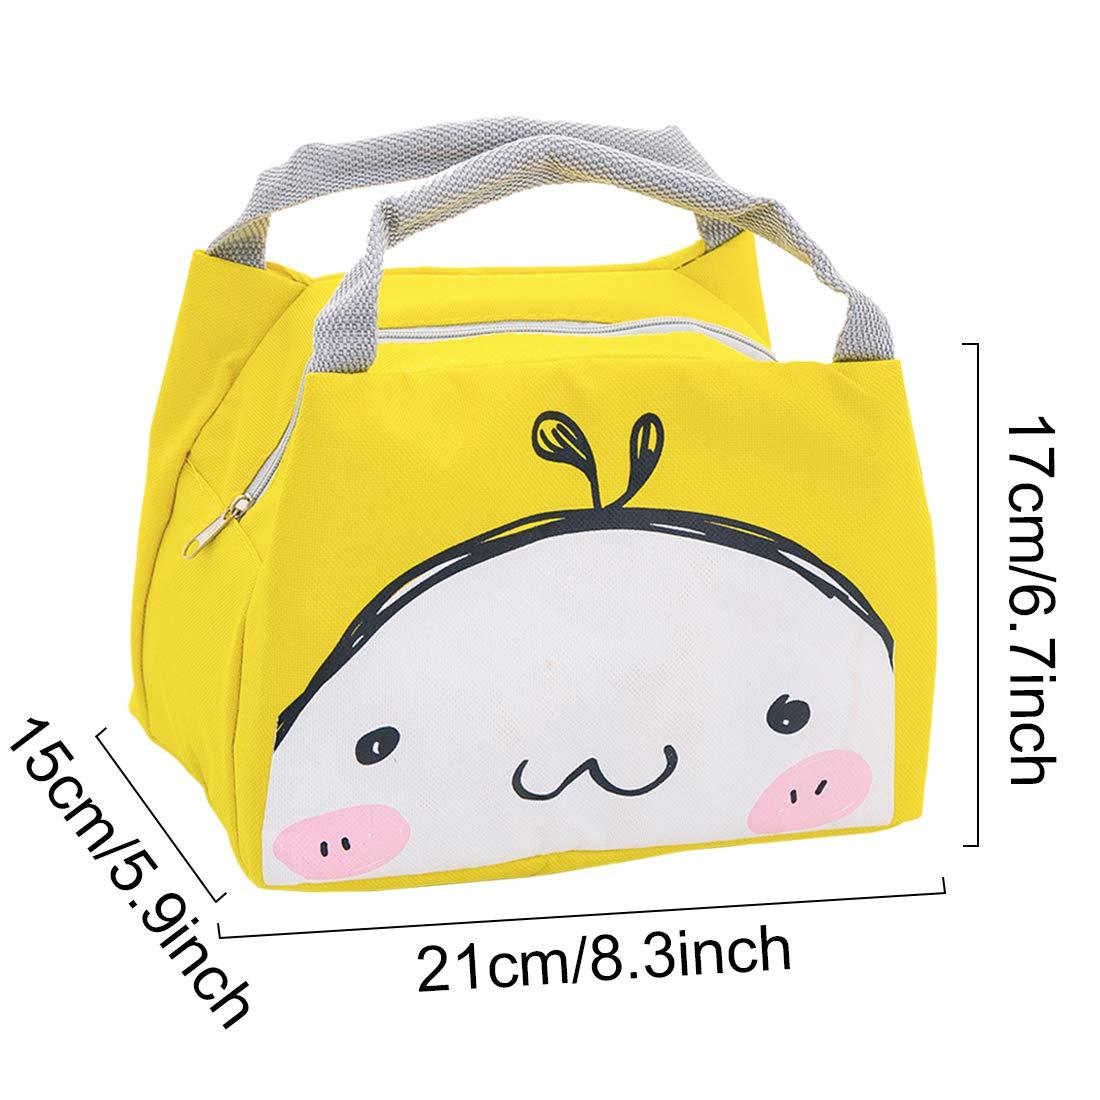 Oyachic Bolsa Termica Bolsas de Almuerzo Lunch Bag Linda Mascota Bolsas de Cremallera Bolsa de Tela Algodon Merienda Impermeable Portátil (cara de la sonrisa): Amazon.es: Hogar